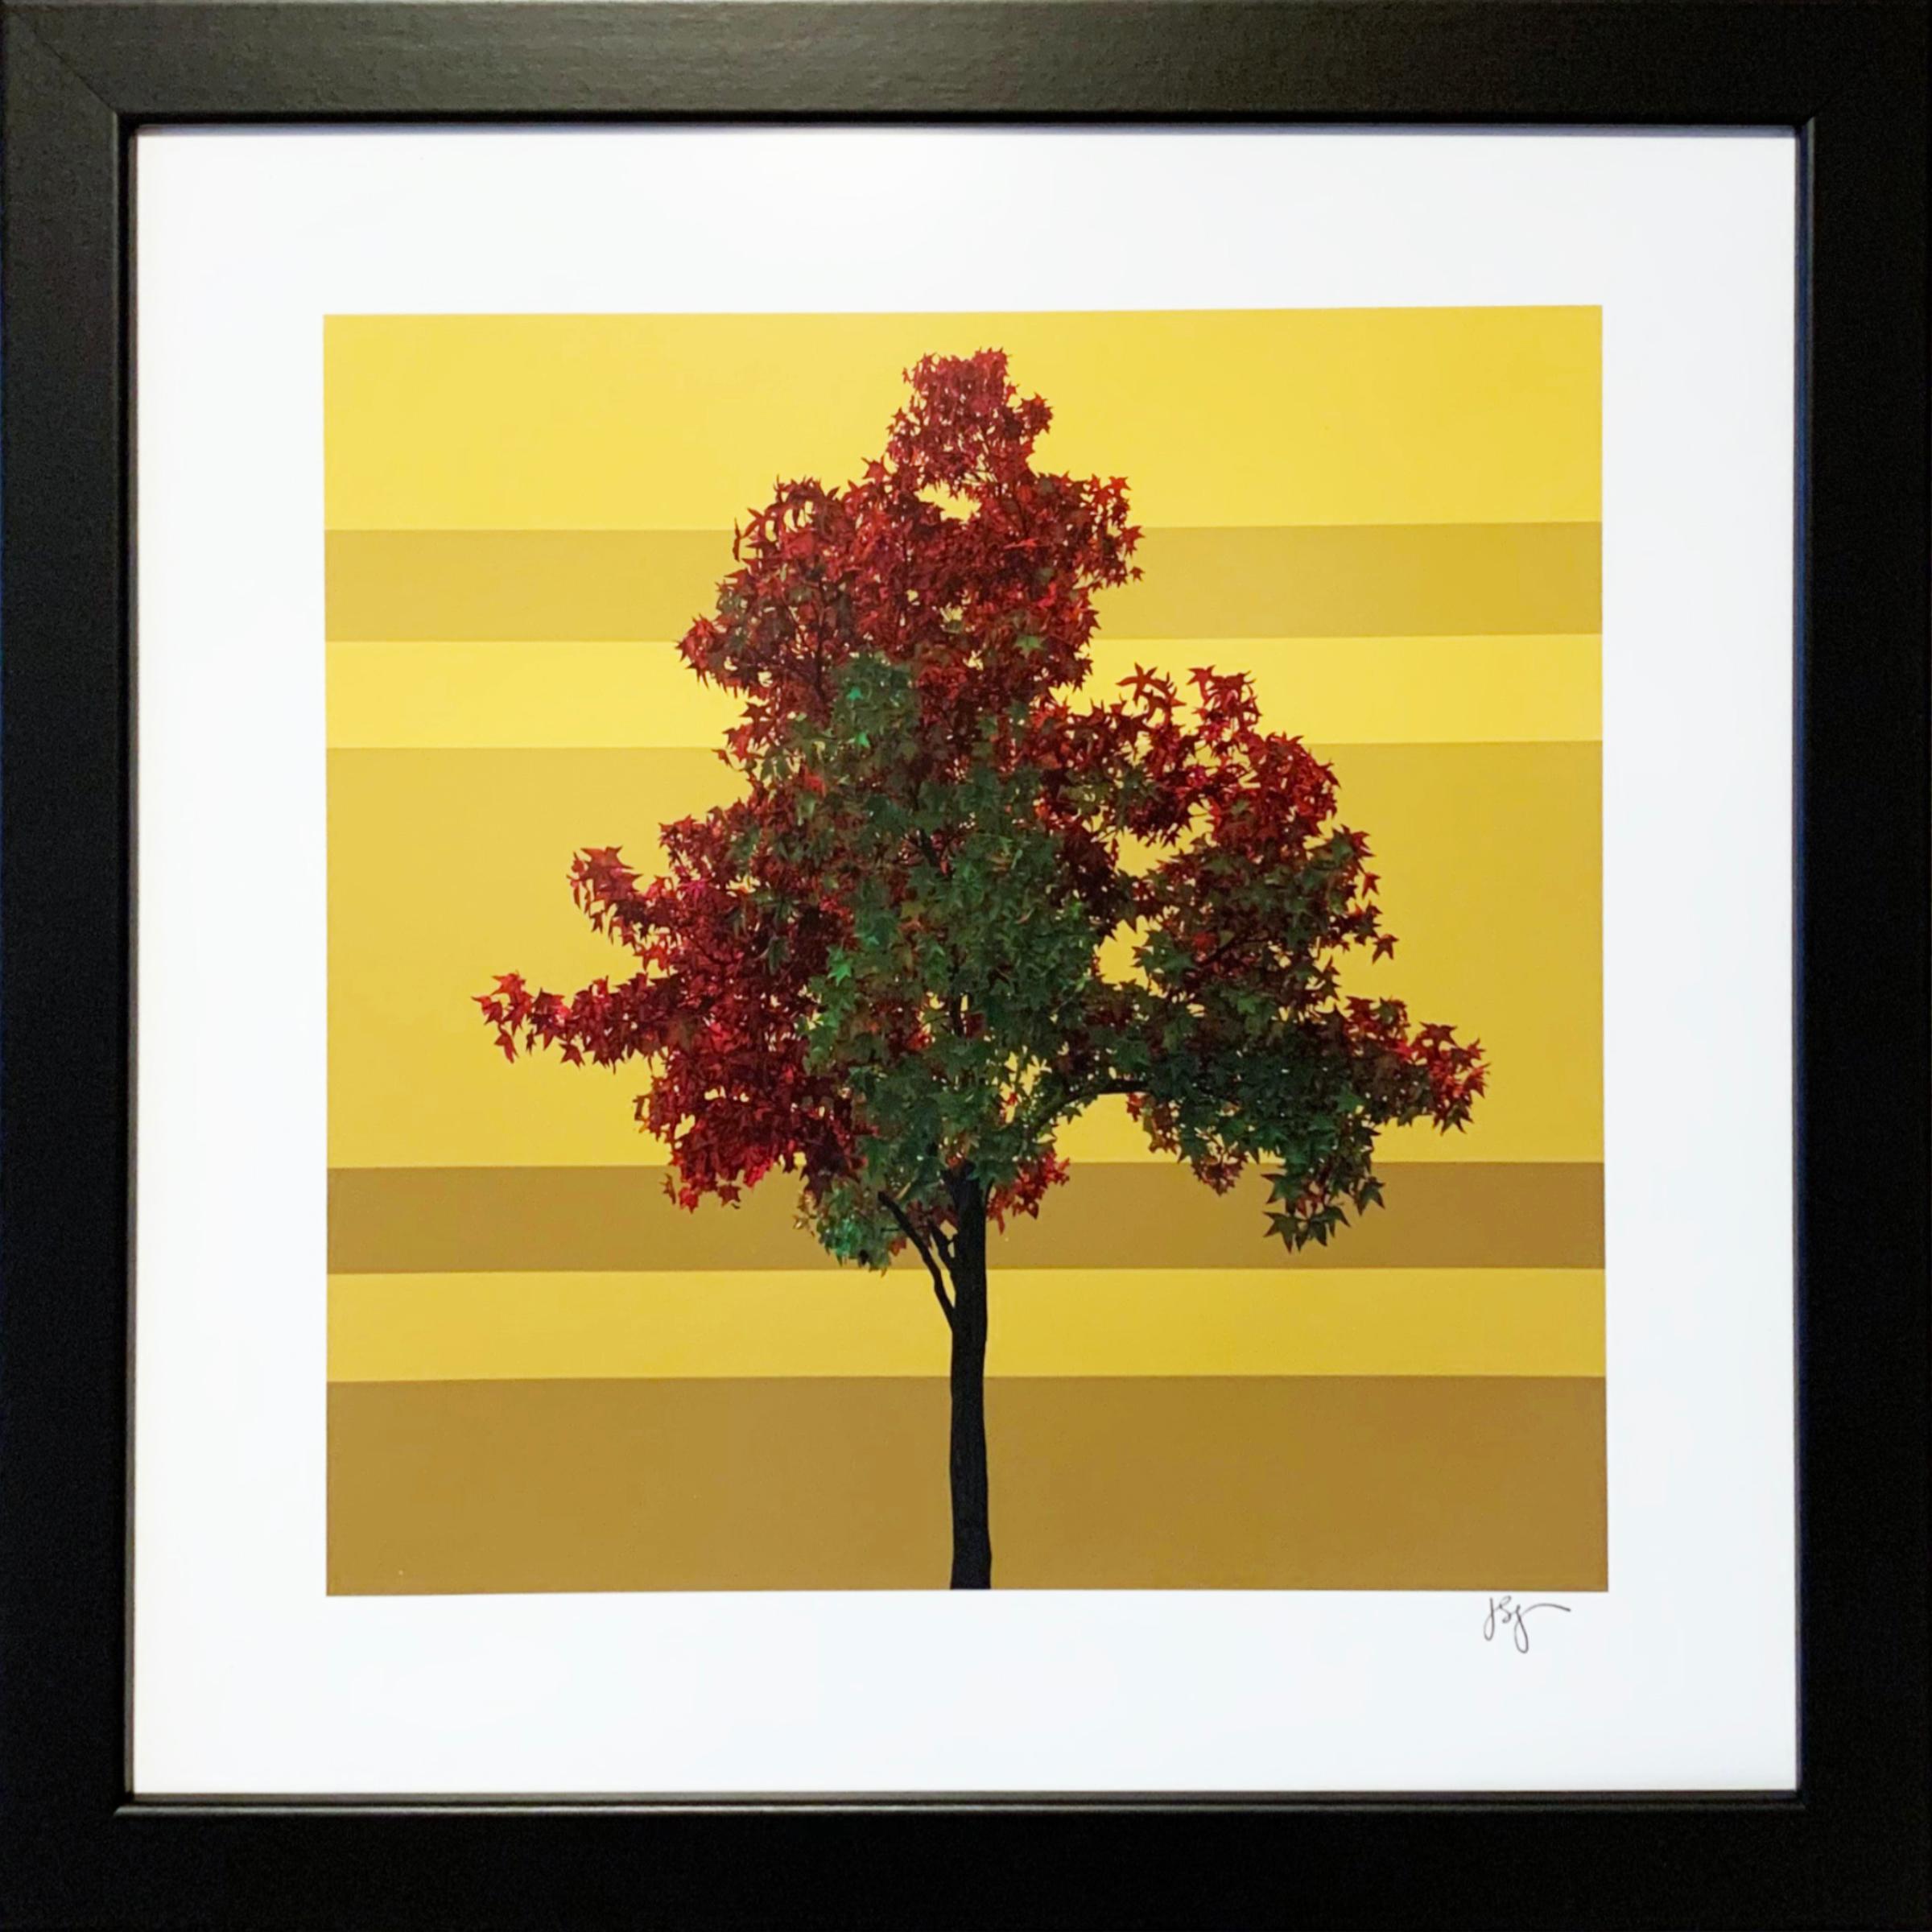 O2023p red tree yxulnl